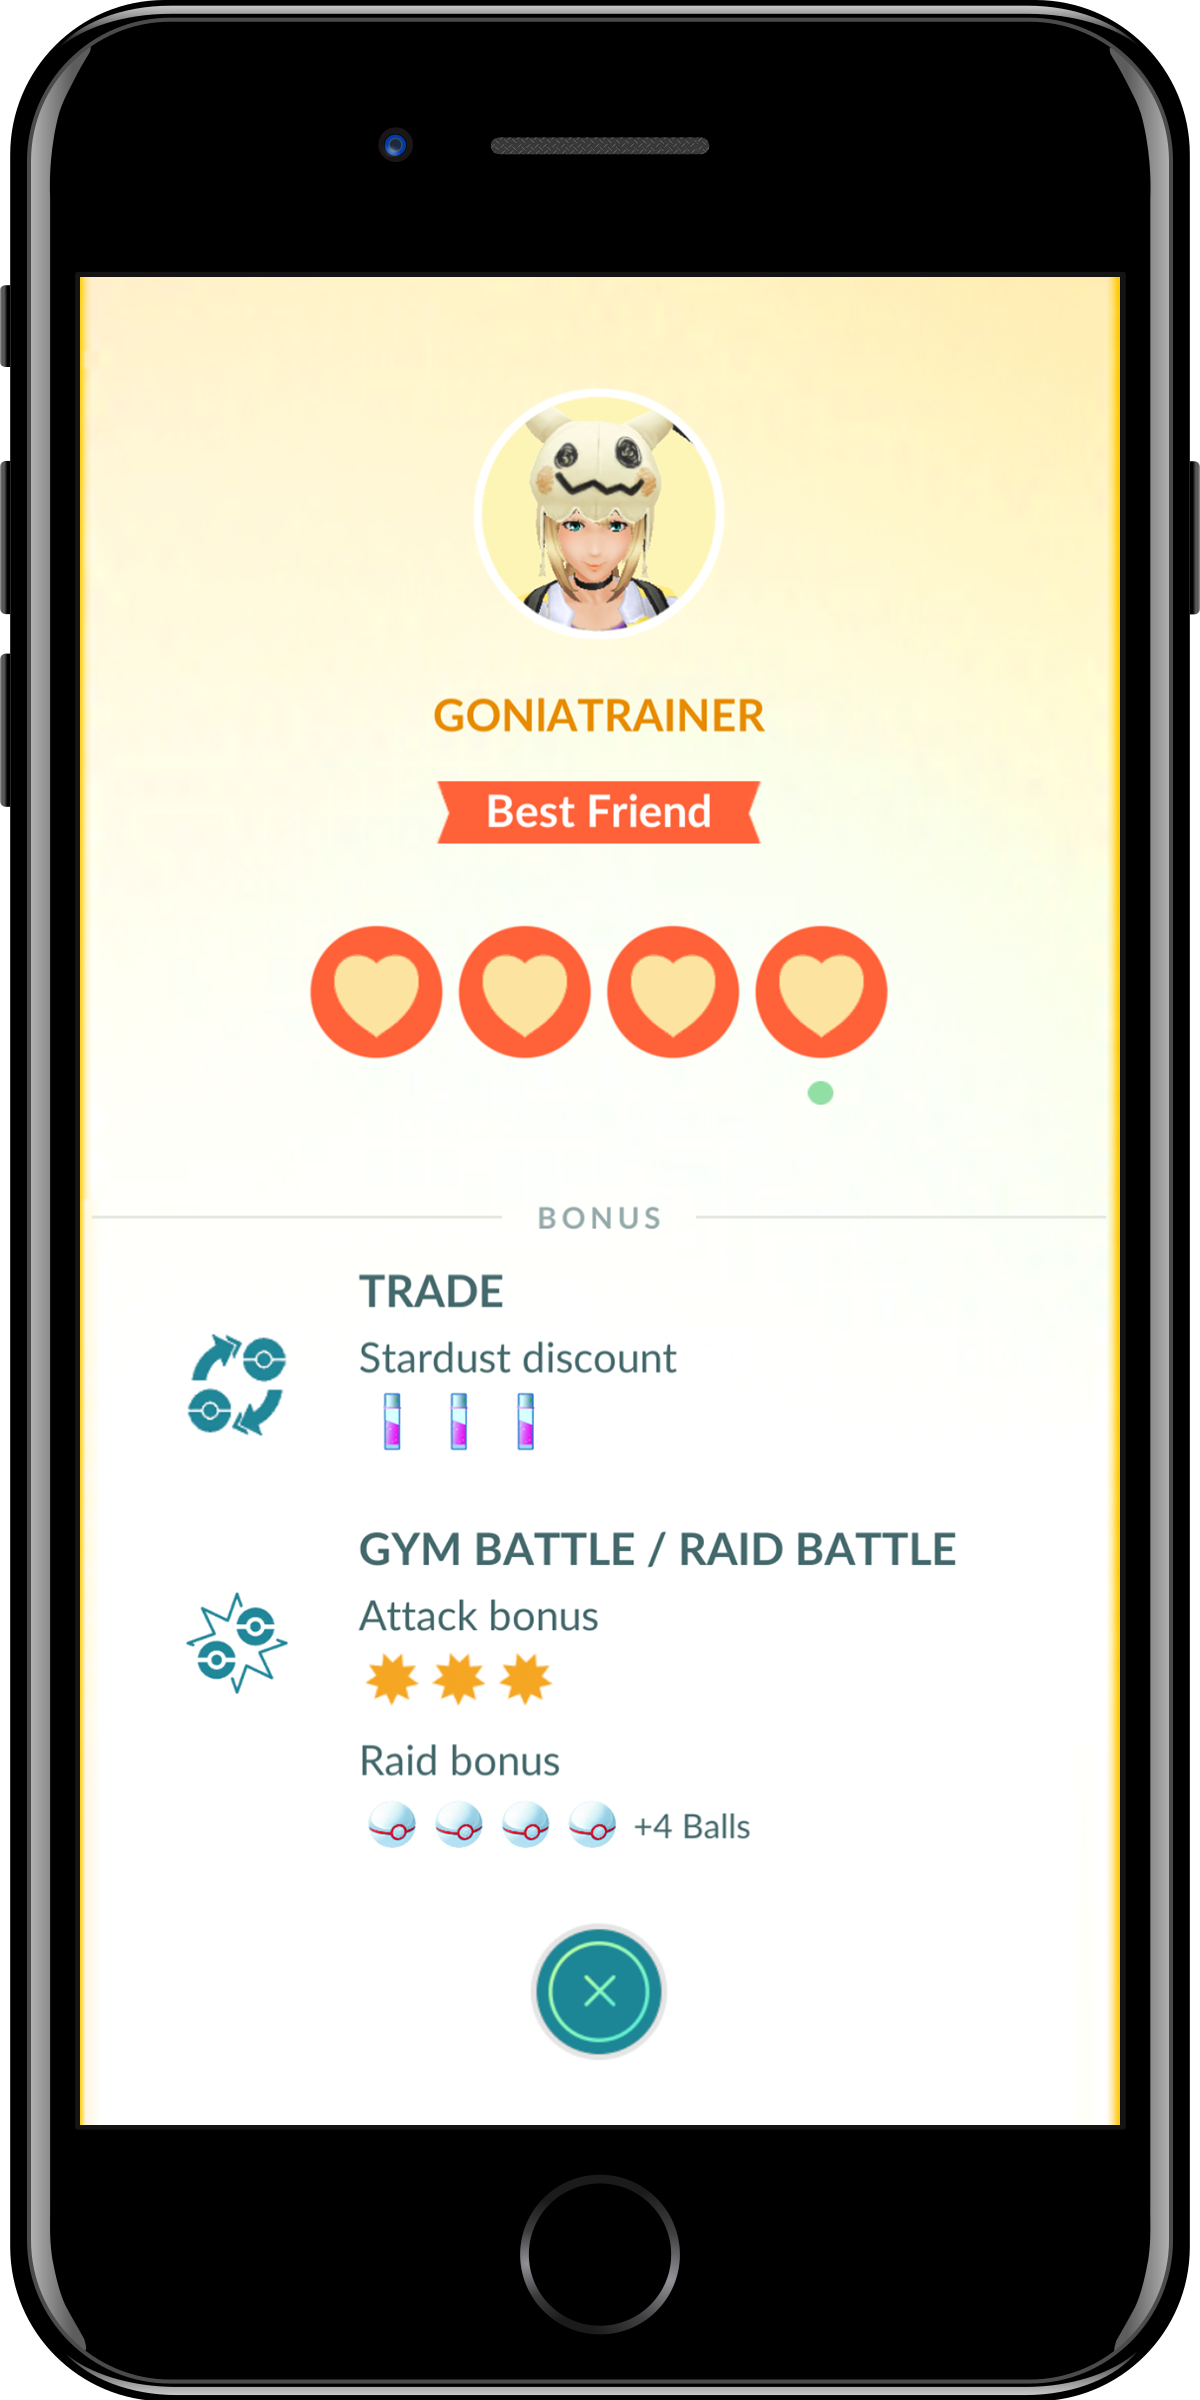 Pokémon Go update: trading Pokémon and friends list - Polygon